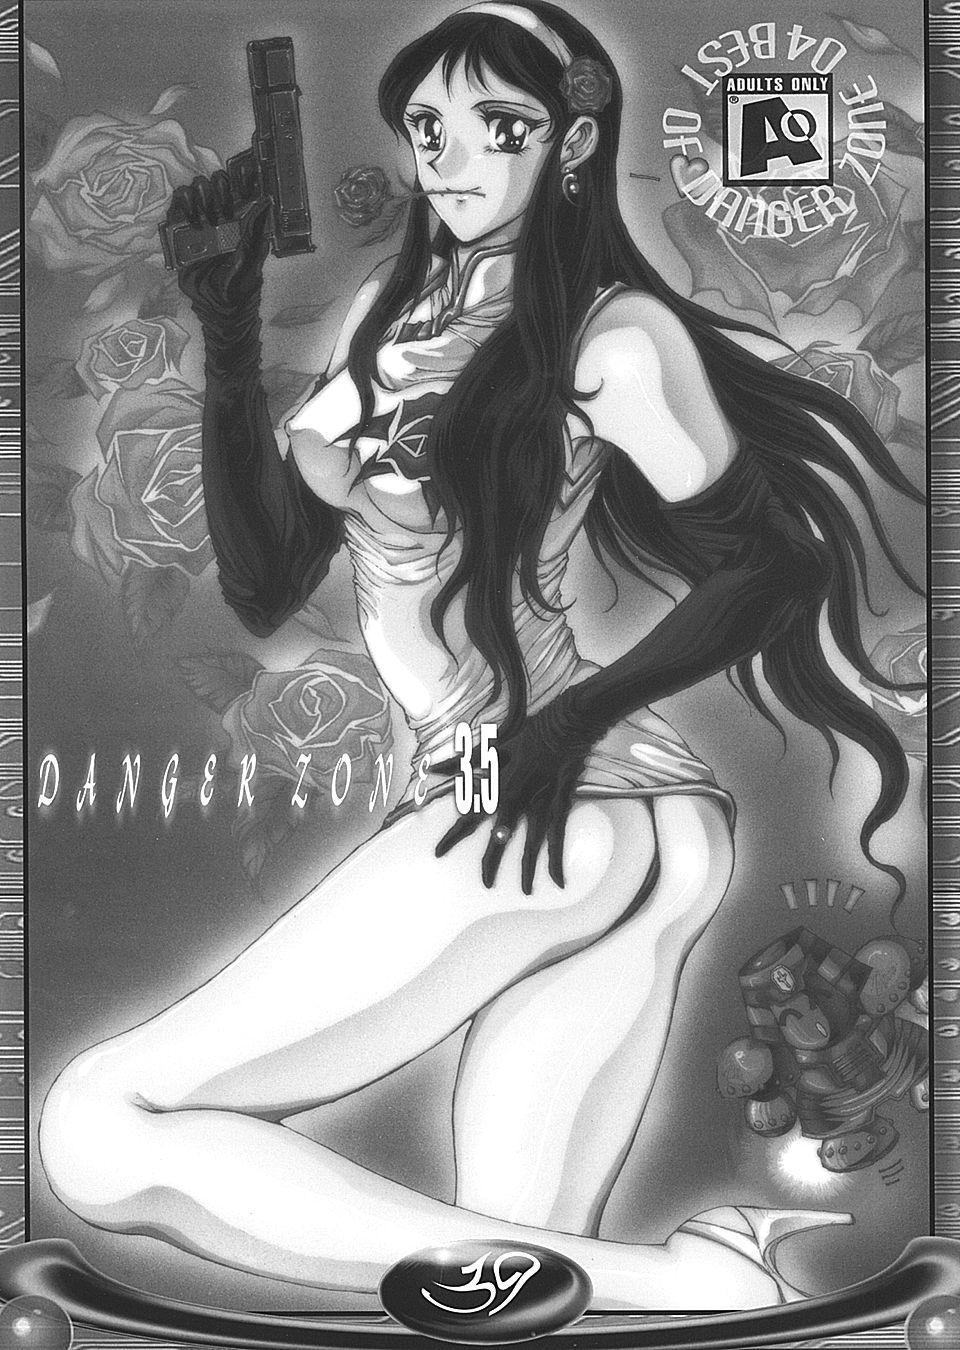 BEST OF DANGER ZONE 04 37